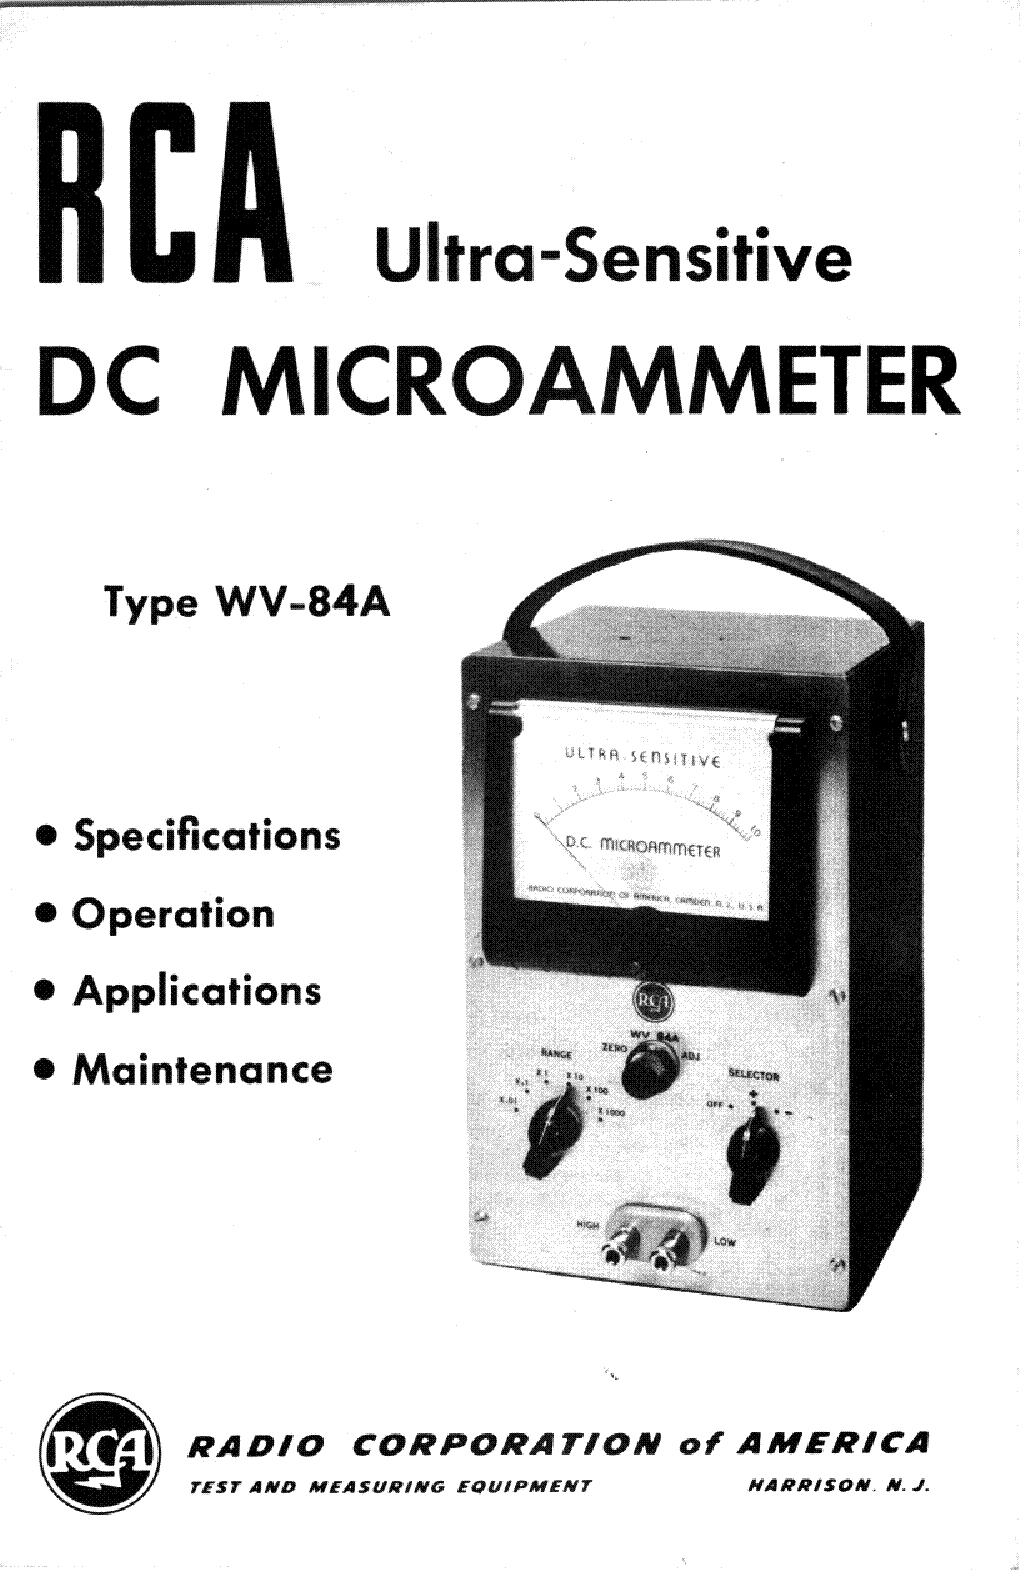 rca wv84a dc microammeter service manual download. Black Bedroom Furniture Sets. Home Design Ideas